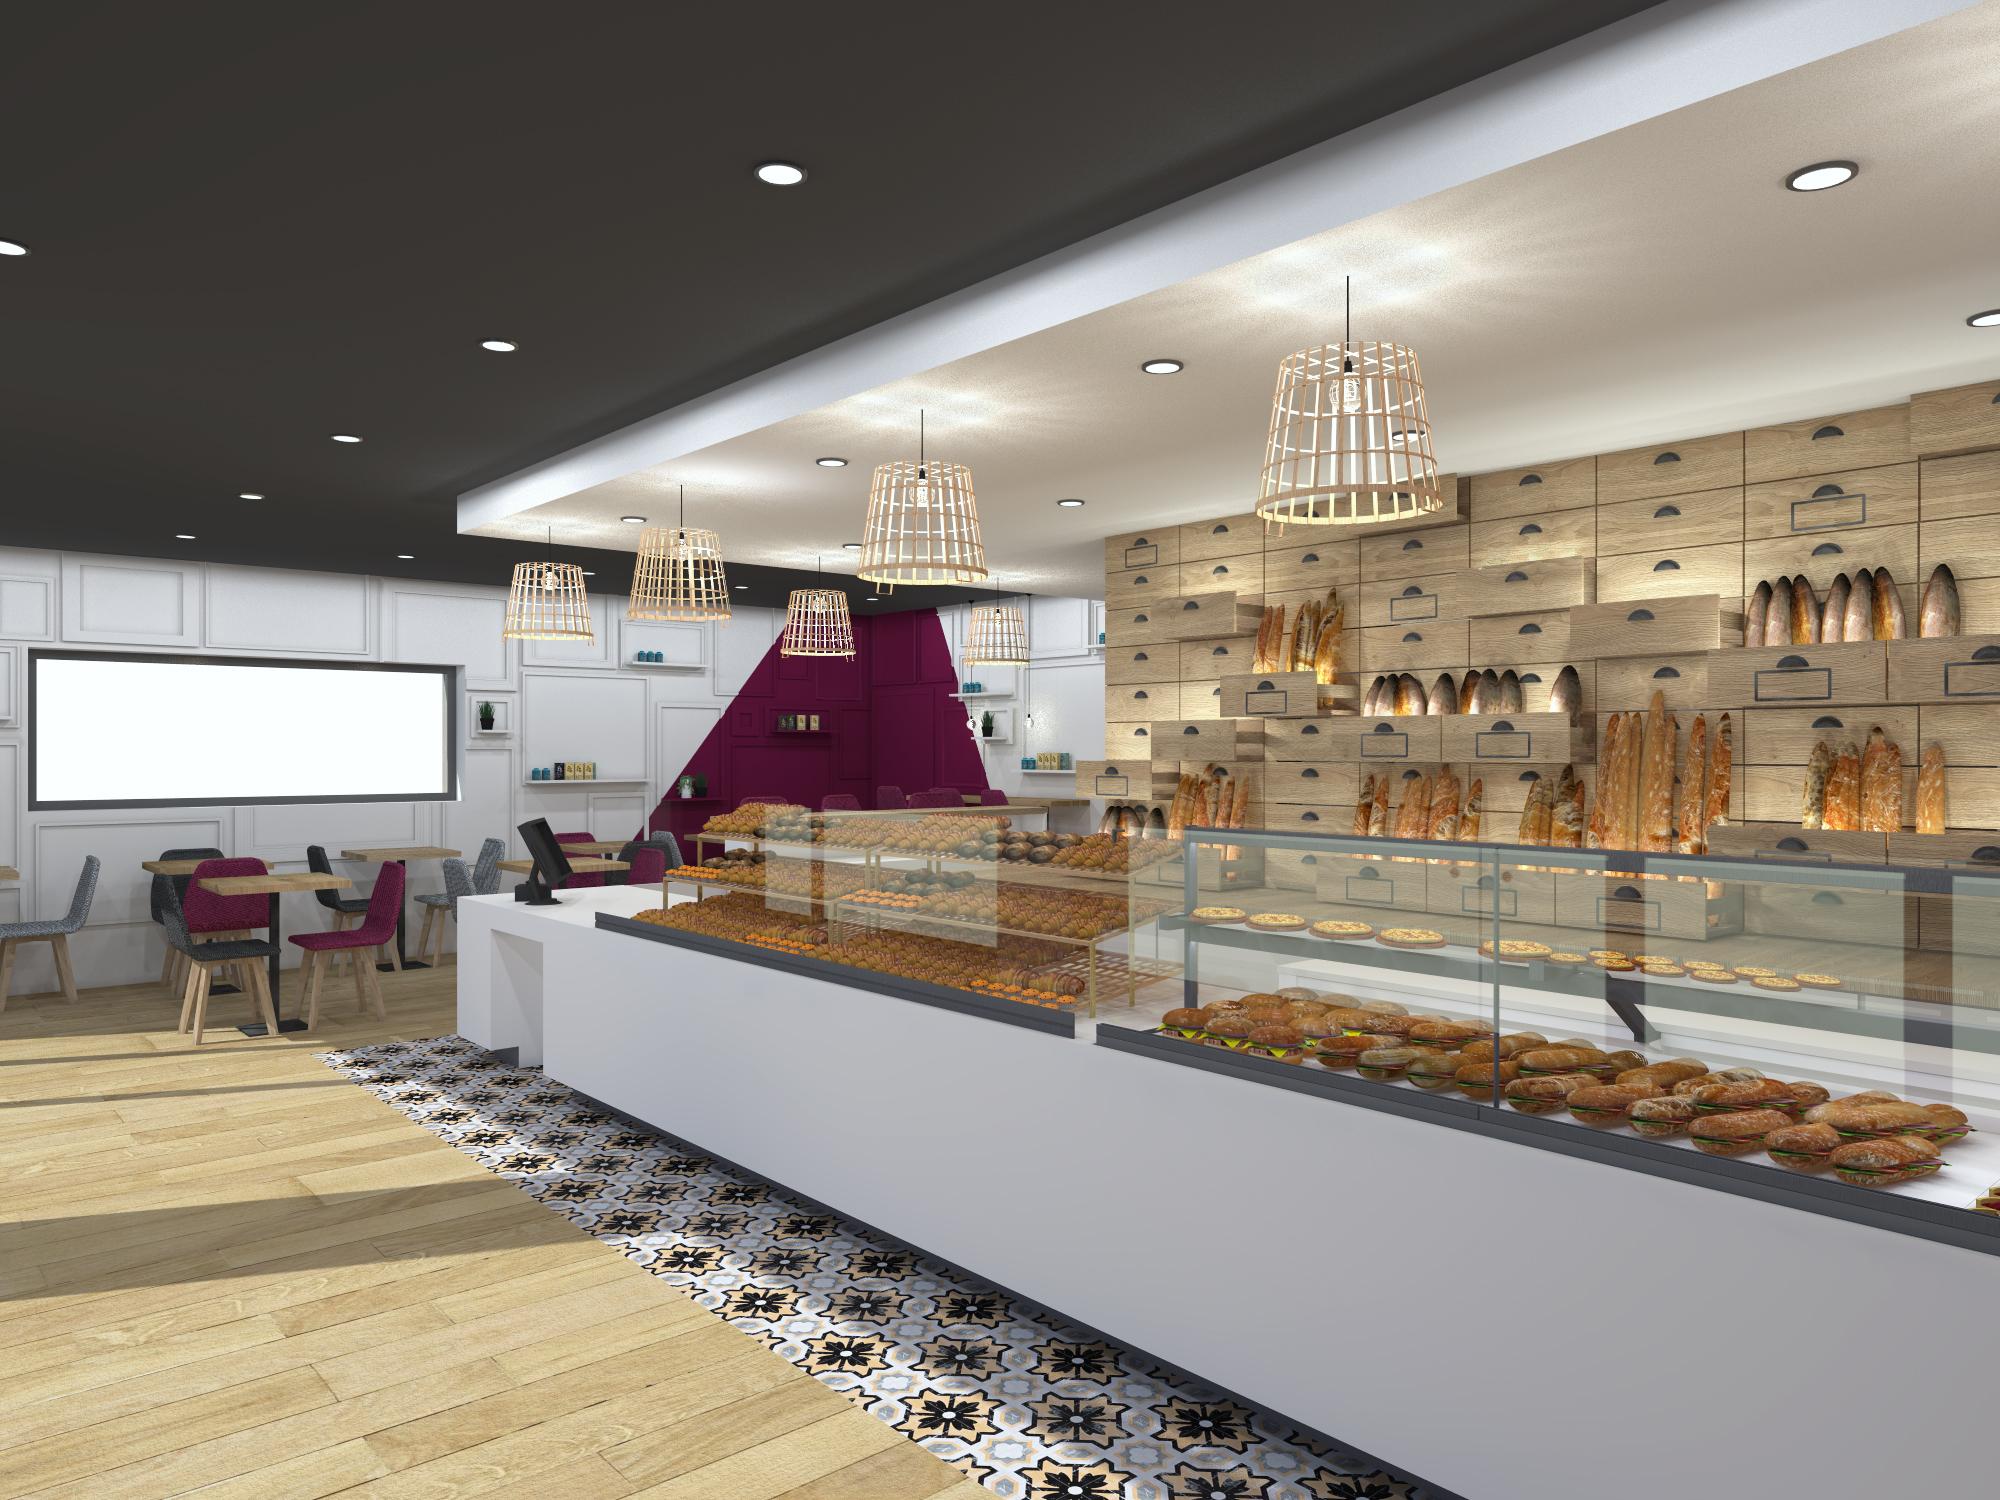 Visuel - Boulangerie Gautier